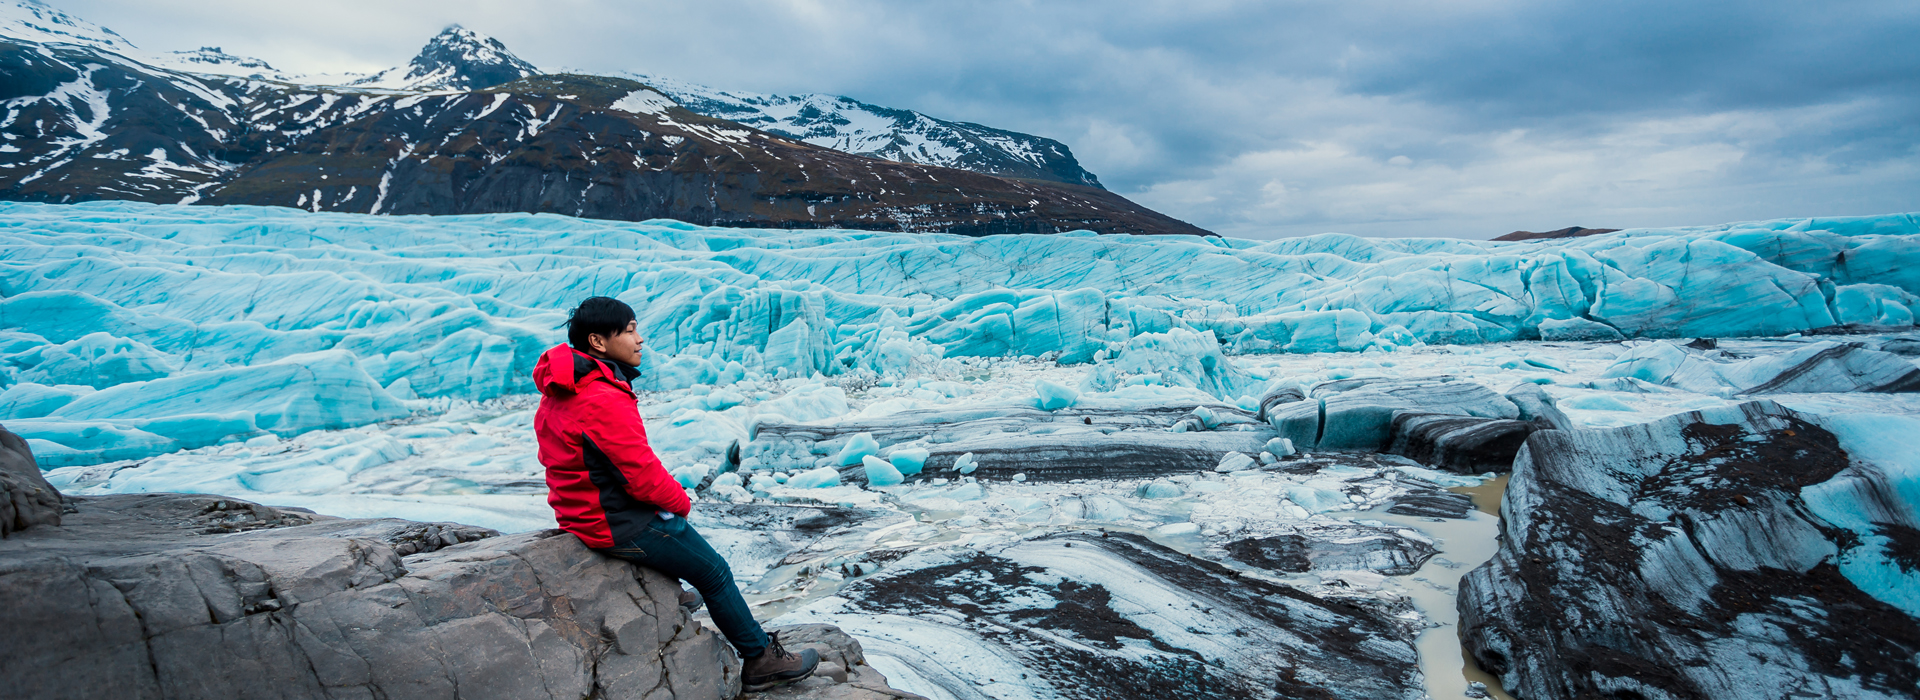 Vatnajokull glacier, the largest ice cap in Iceland